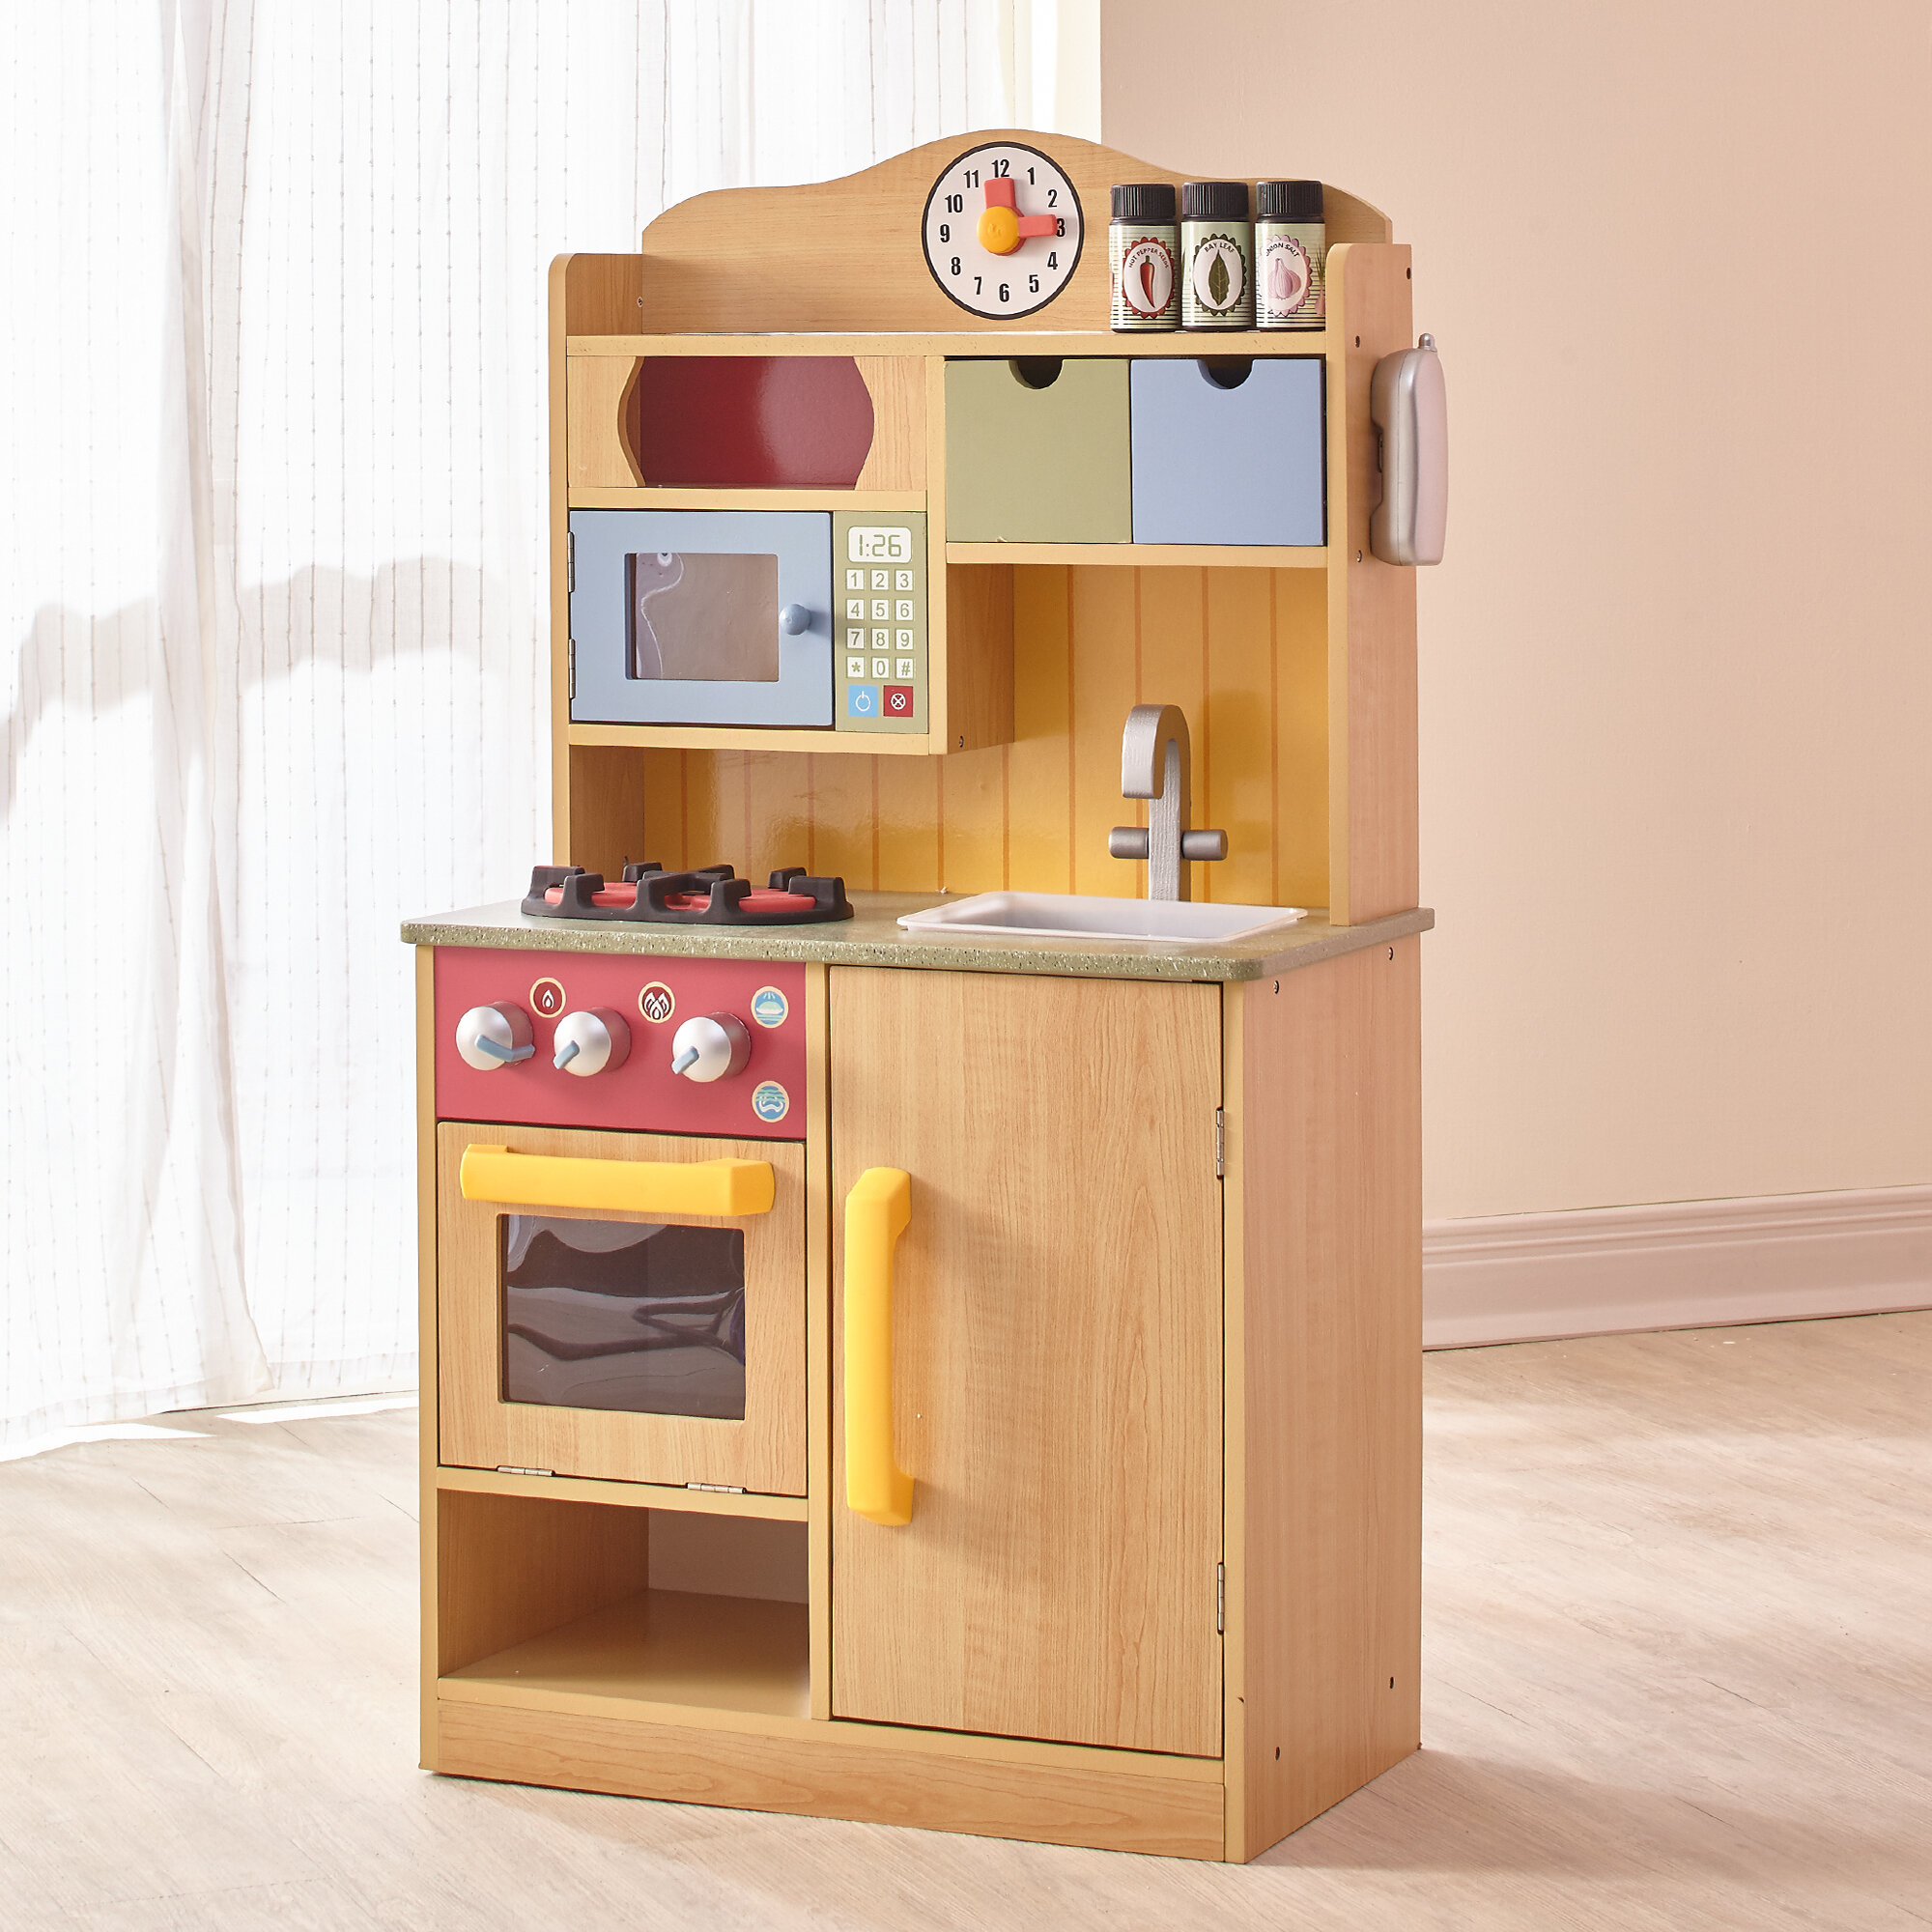 Teamson Kids 5 Piece Little Chef Wooden Play Kitchen Set Reviews